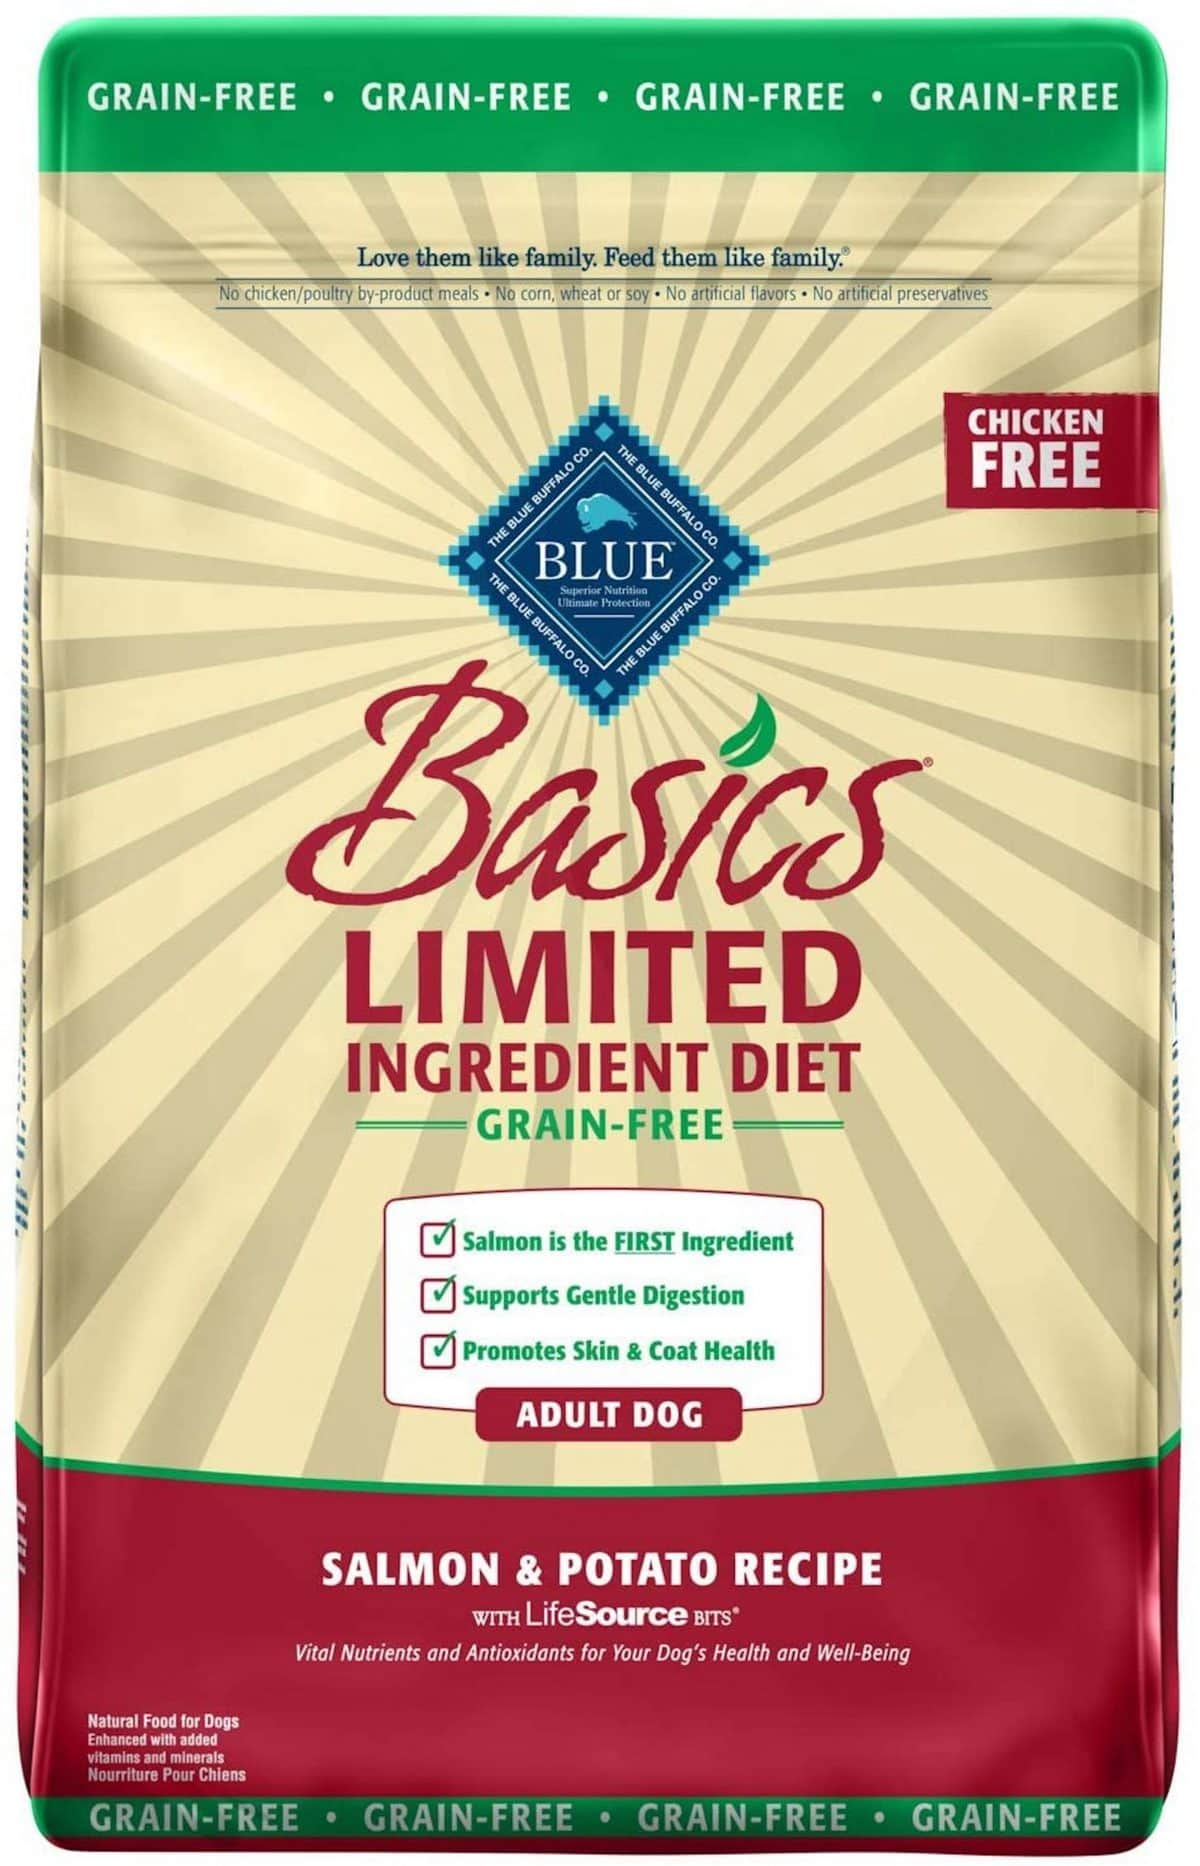 Blue Buffalo Basics Limited Ingredient Grain-Free Salmon & Sweet Potato